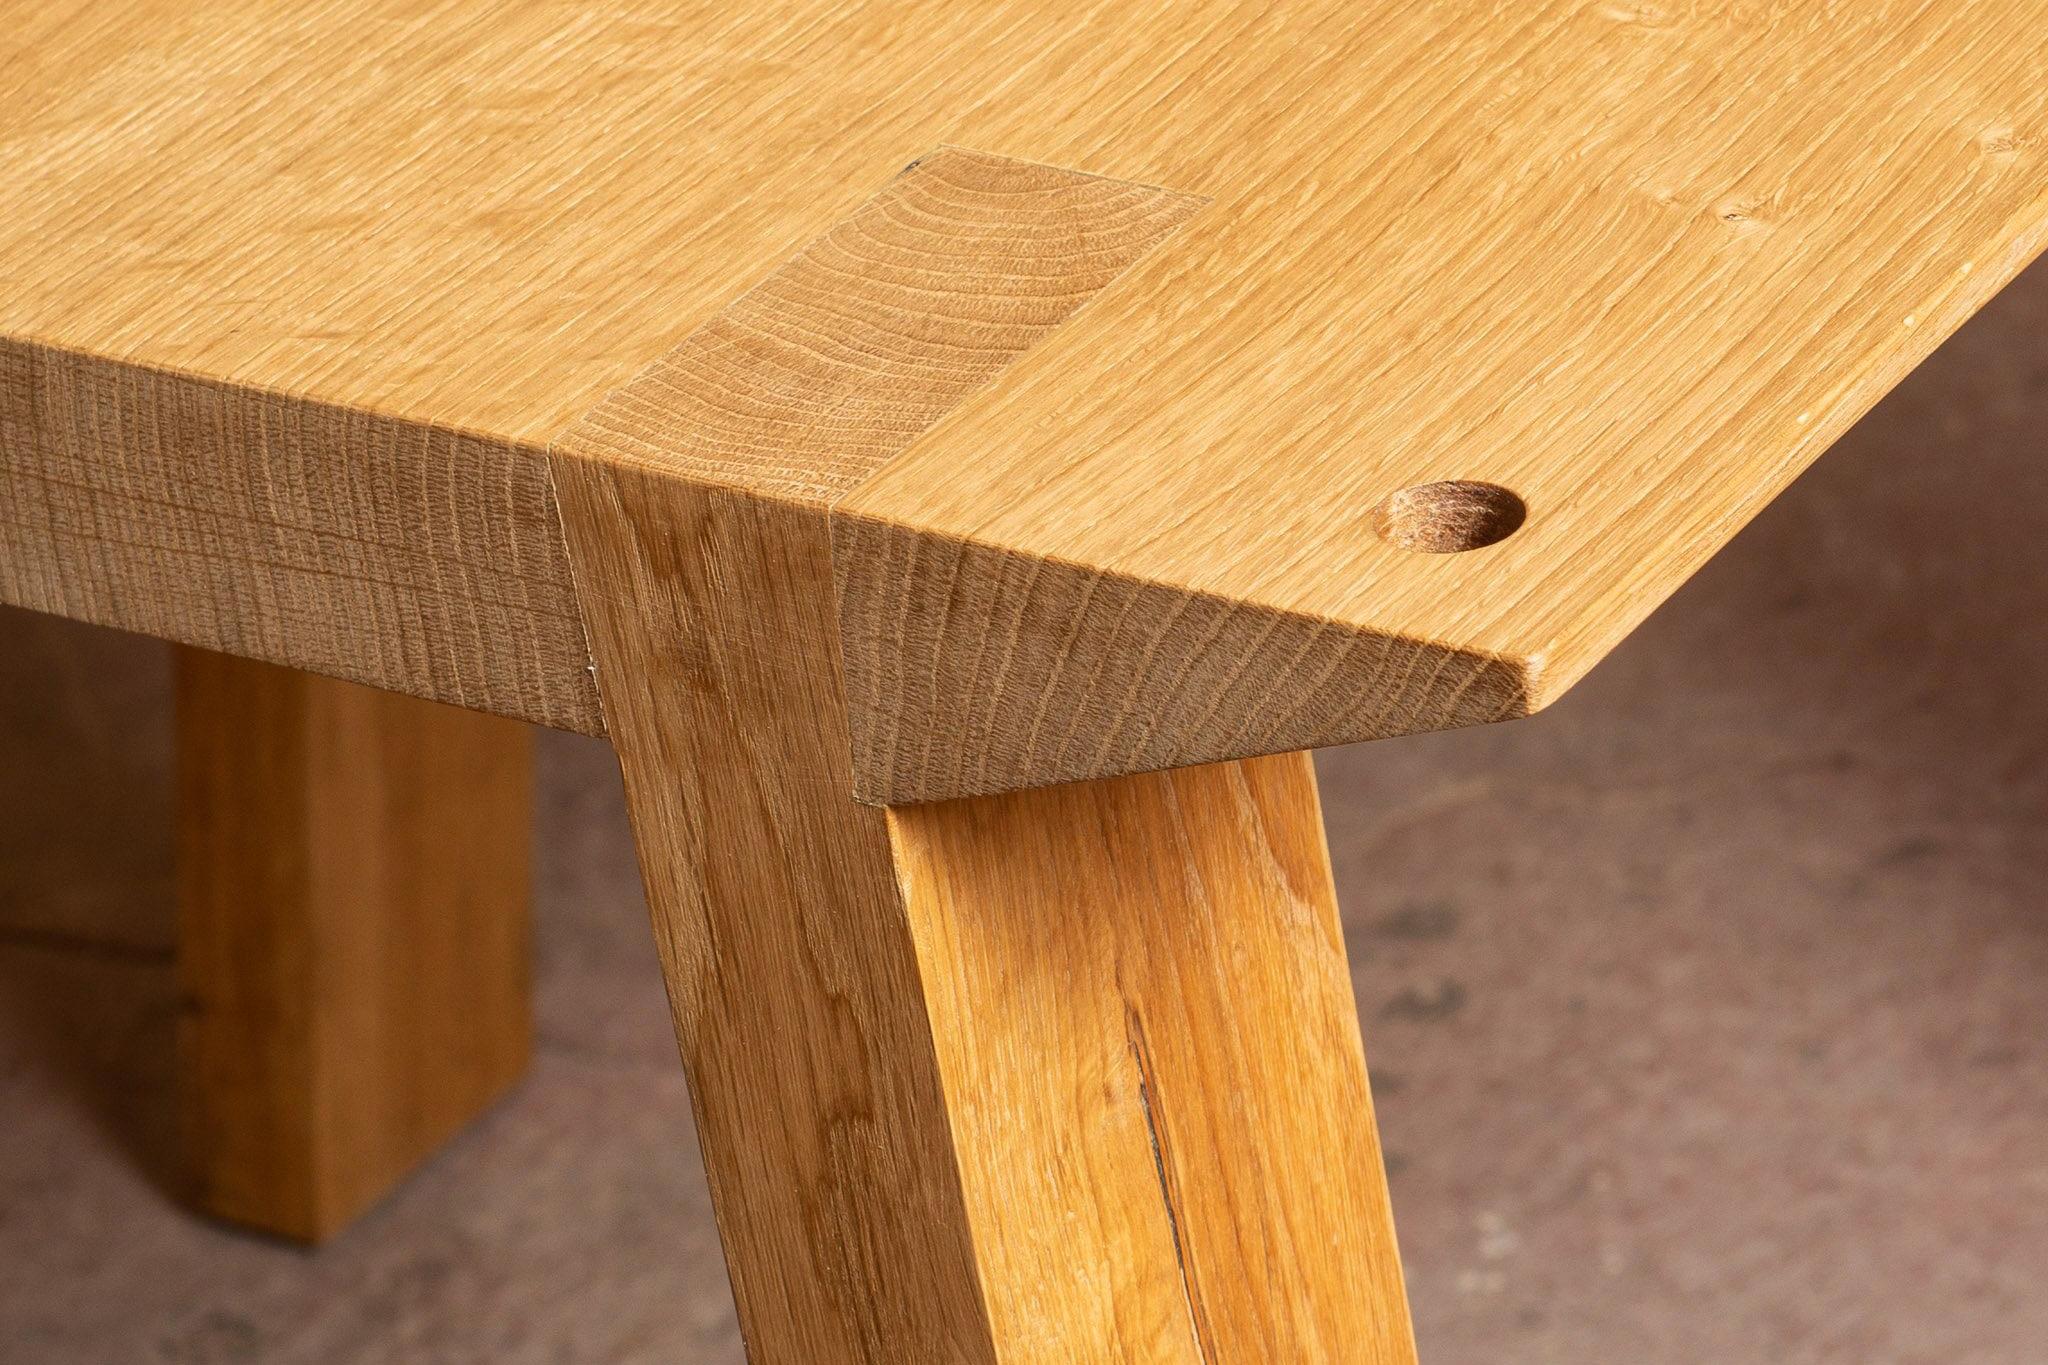 Vud Design Tavoli artigianali legno Trieste